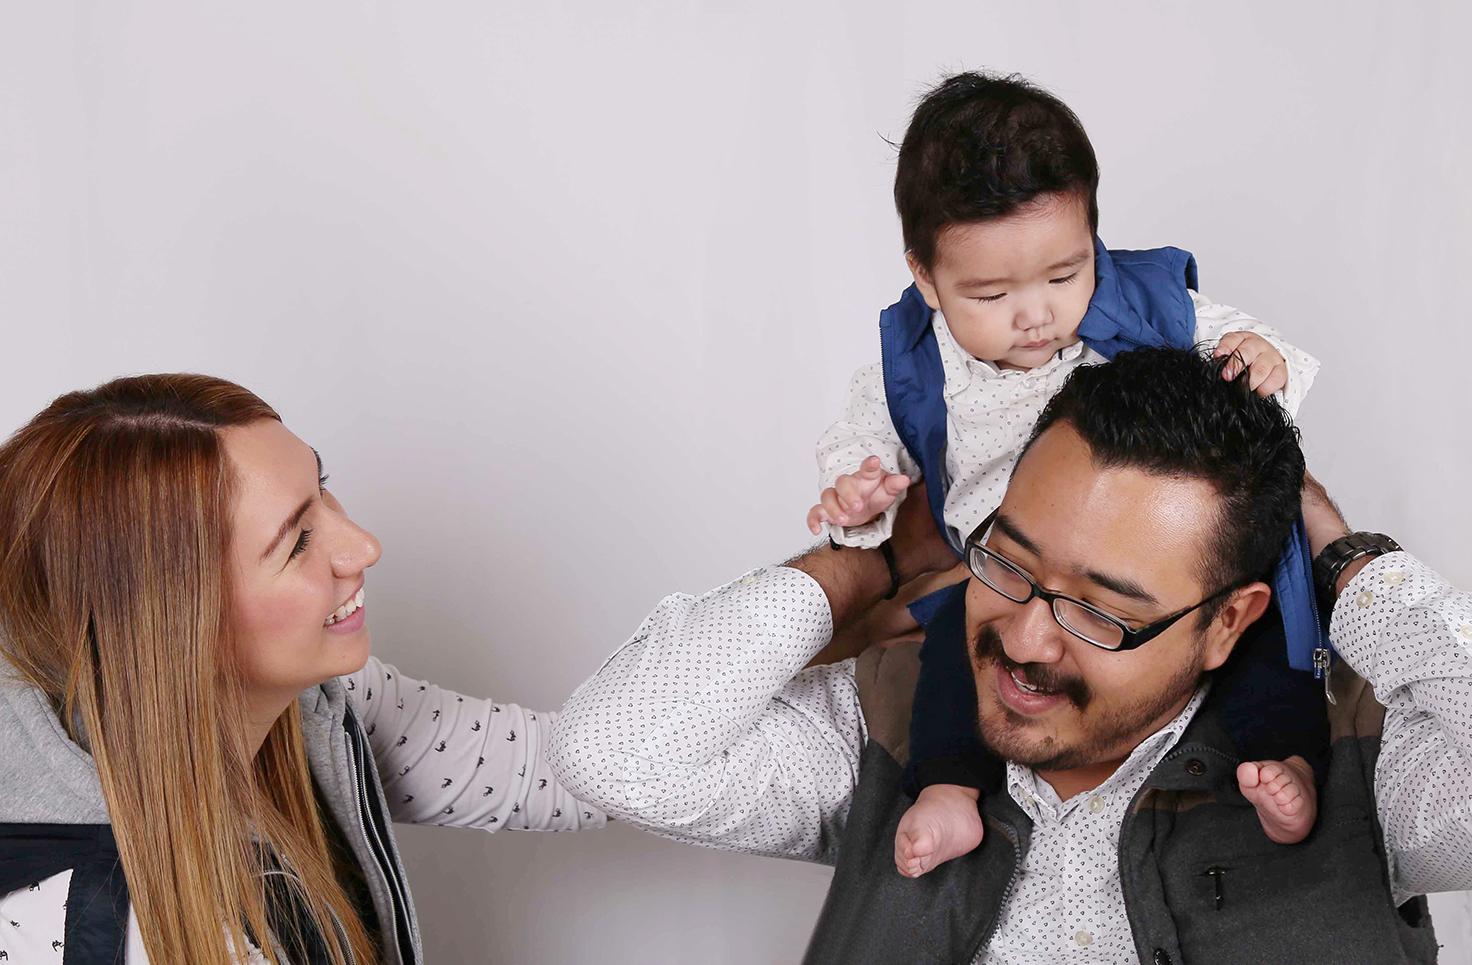 Maroge-Angela-Velazquez-fotografia-bebe-45